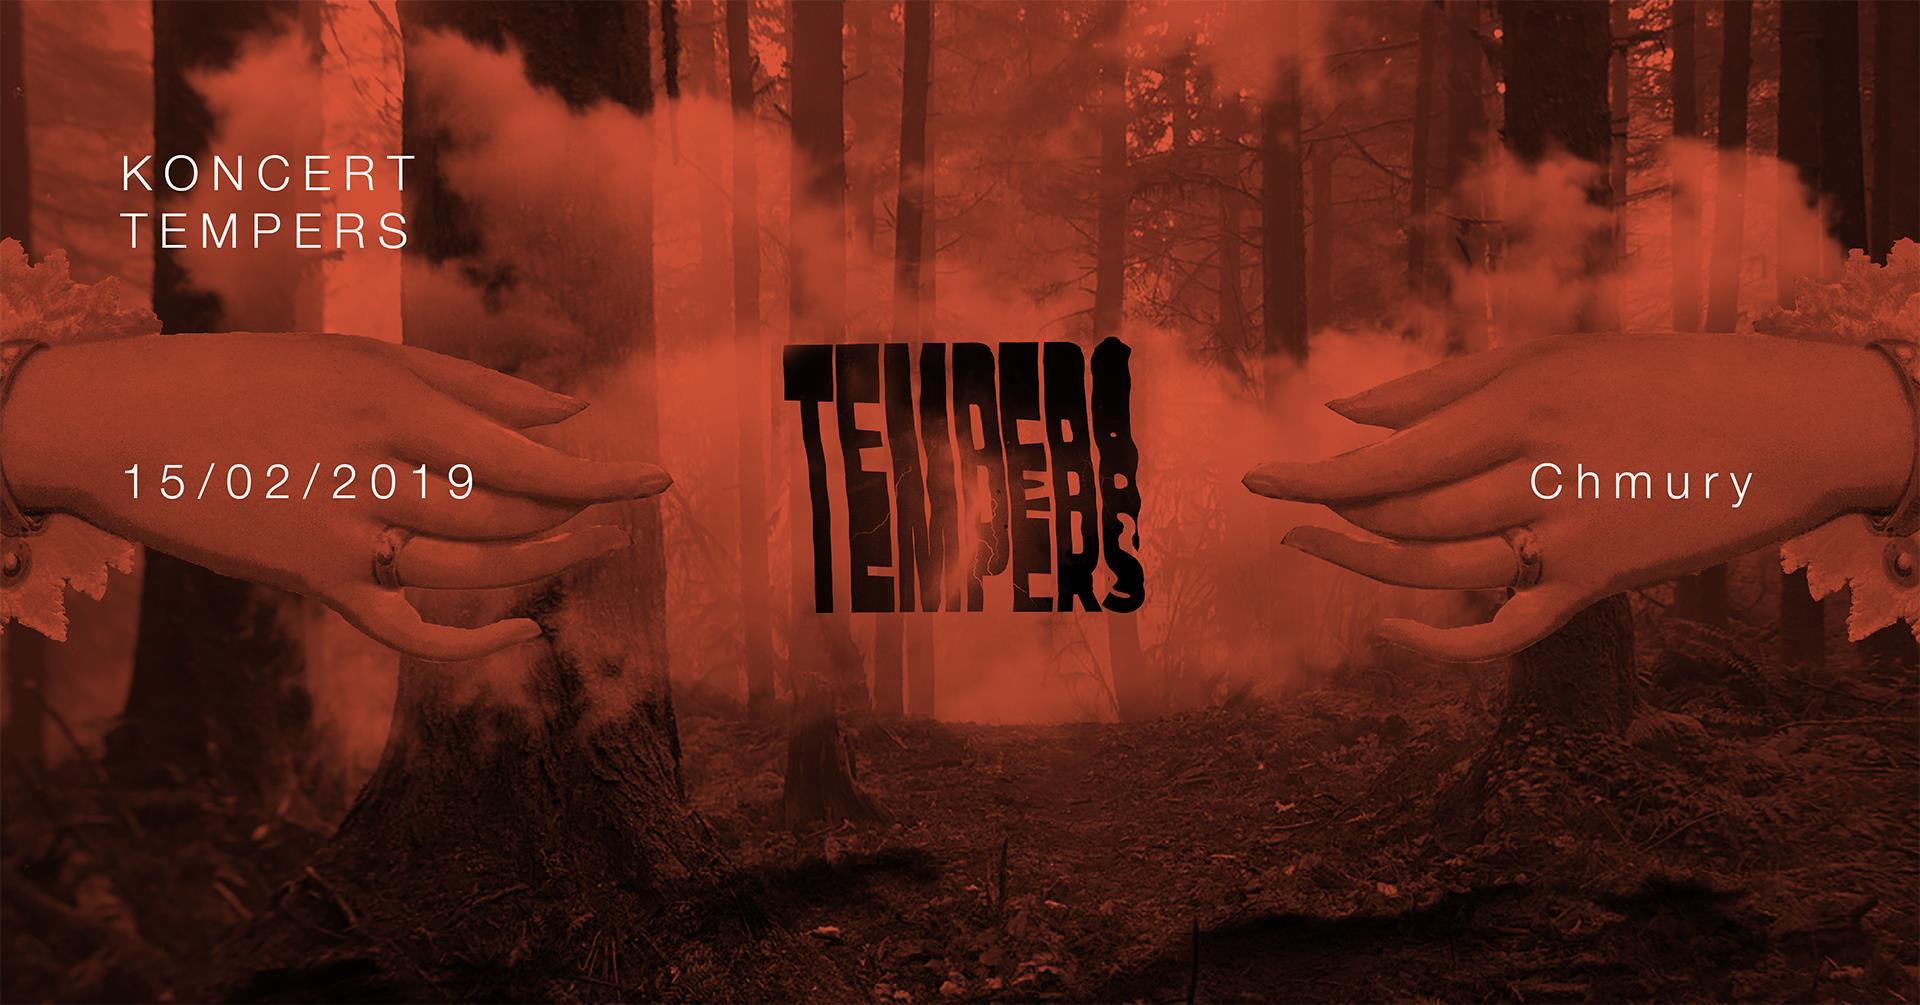 Tempers - Chmury - Warszawa - 15.02.2019